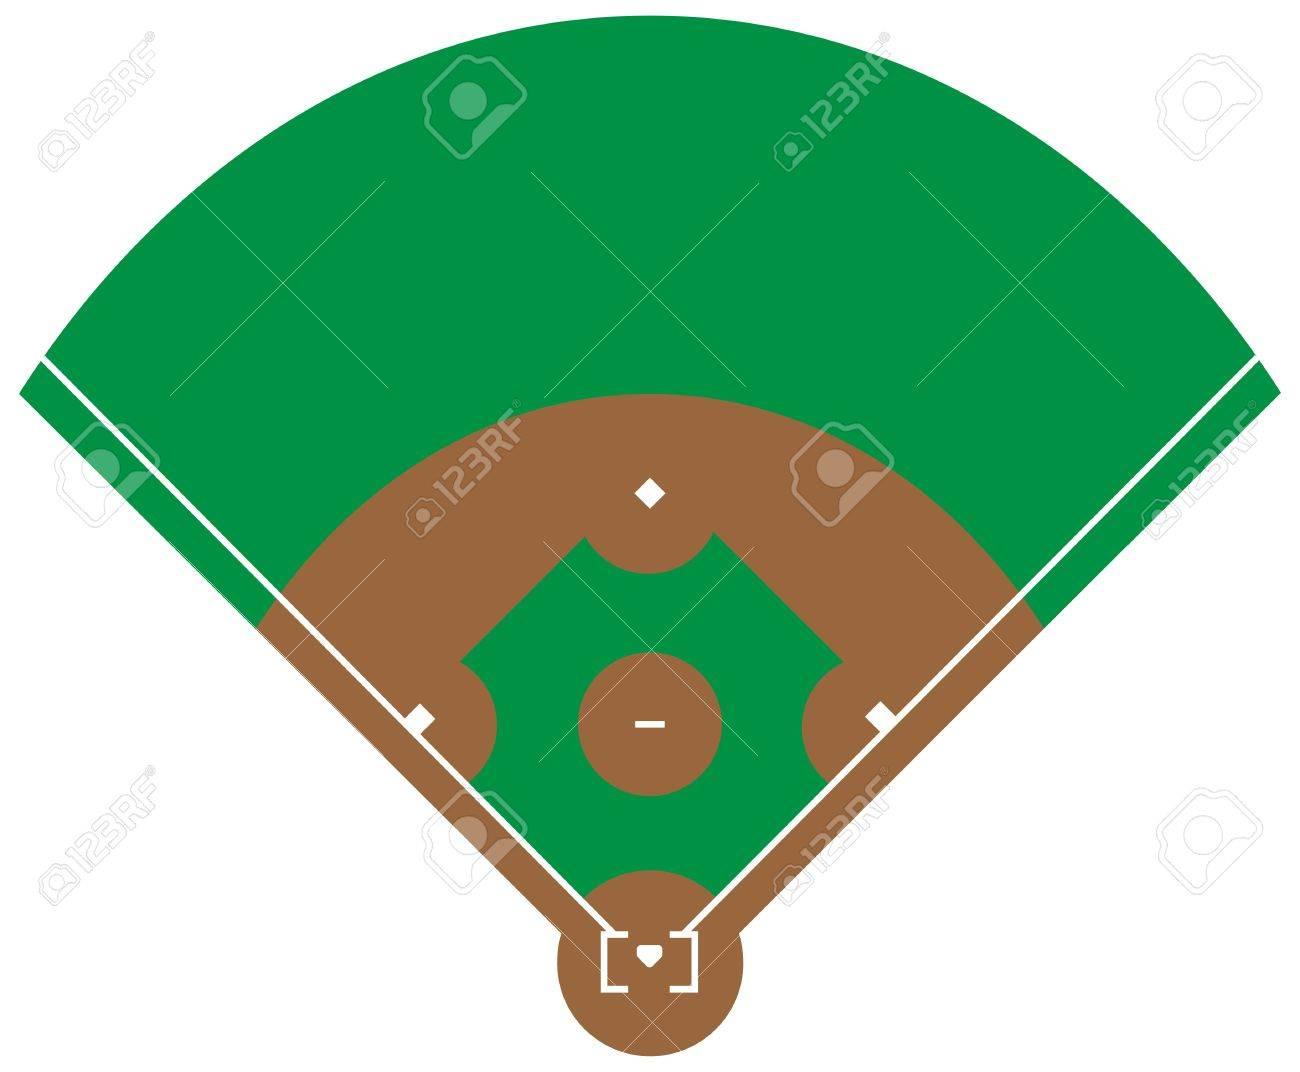 Flat Green Baseball Grass Field Baseball Base With Line Template